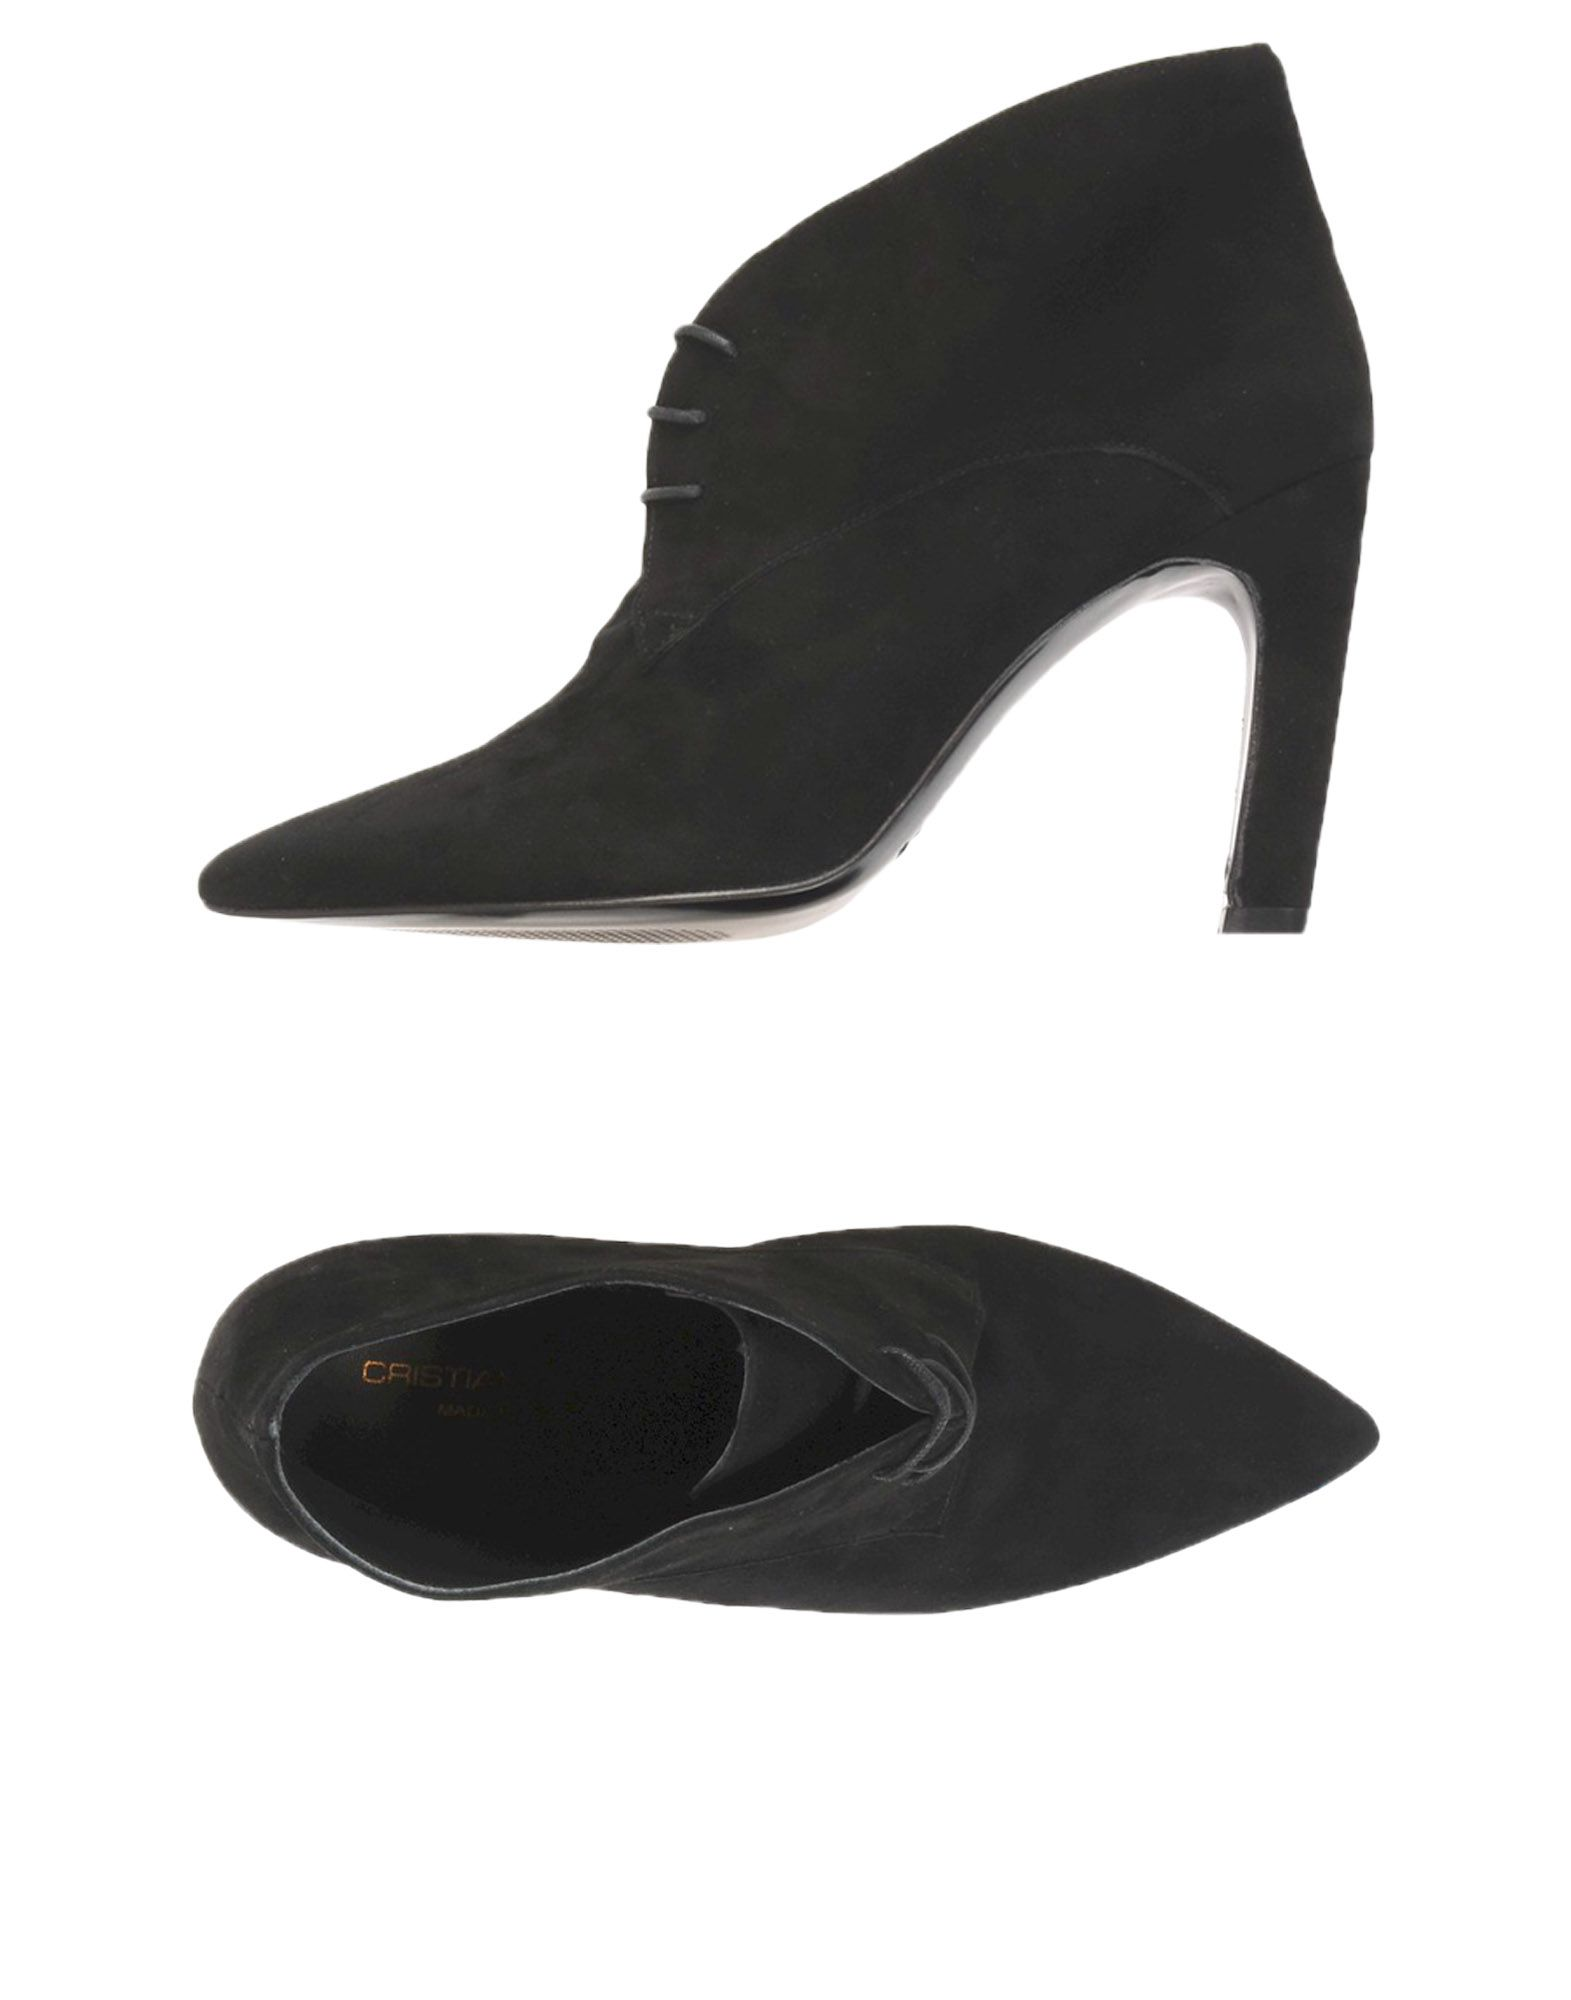 Cristian Daniel Schnürschuhe Damen  11546598PIGut aussehende strapazierfähige Schuhe